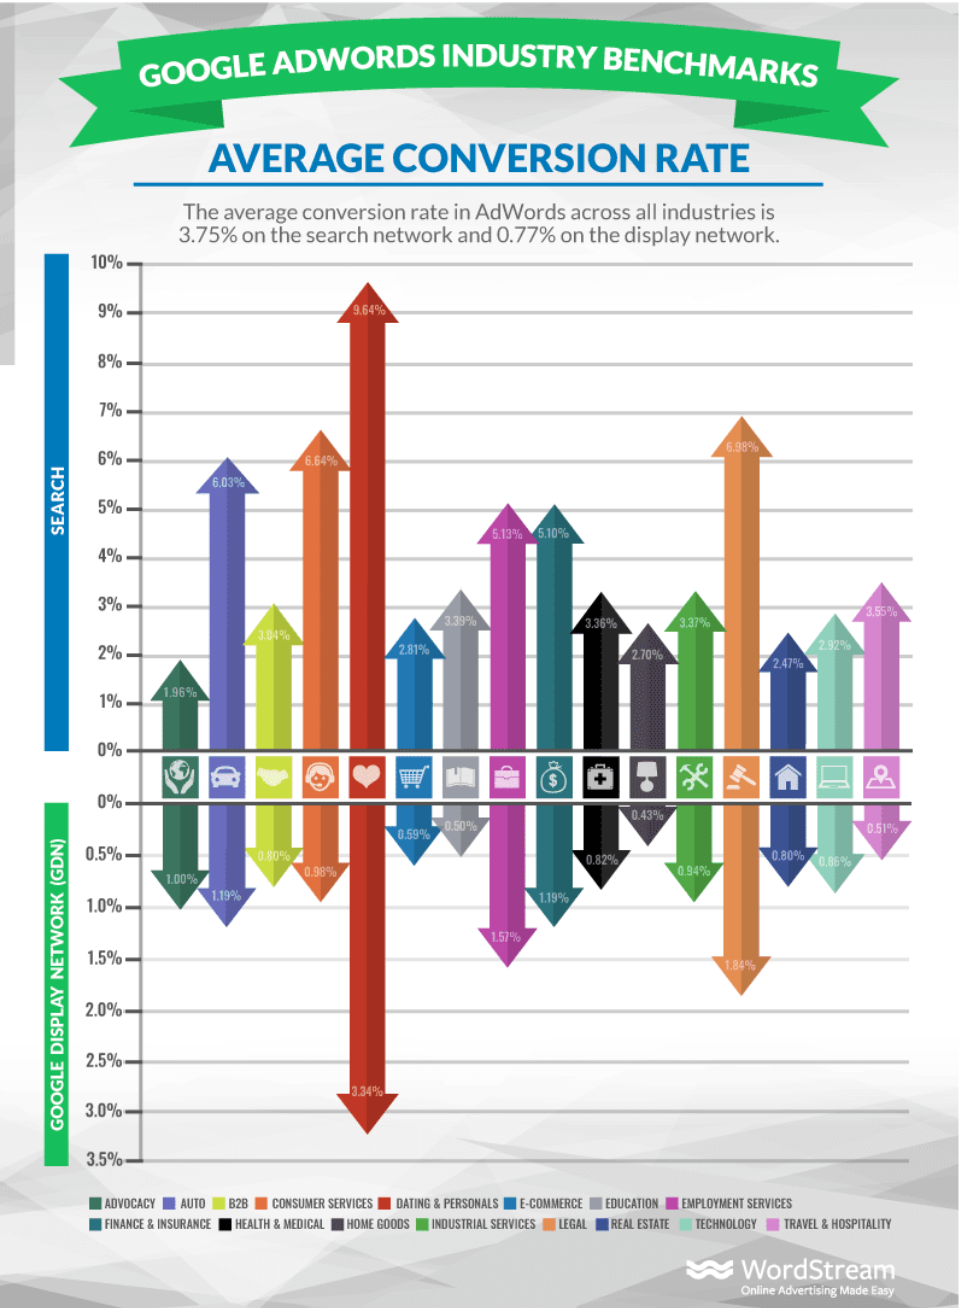 Adwords benchmark